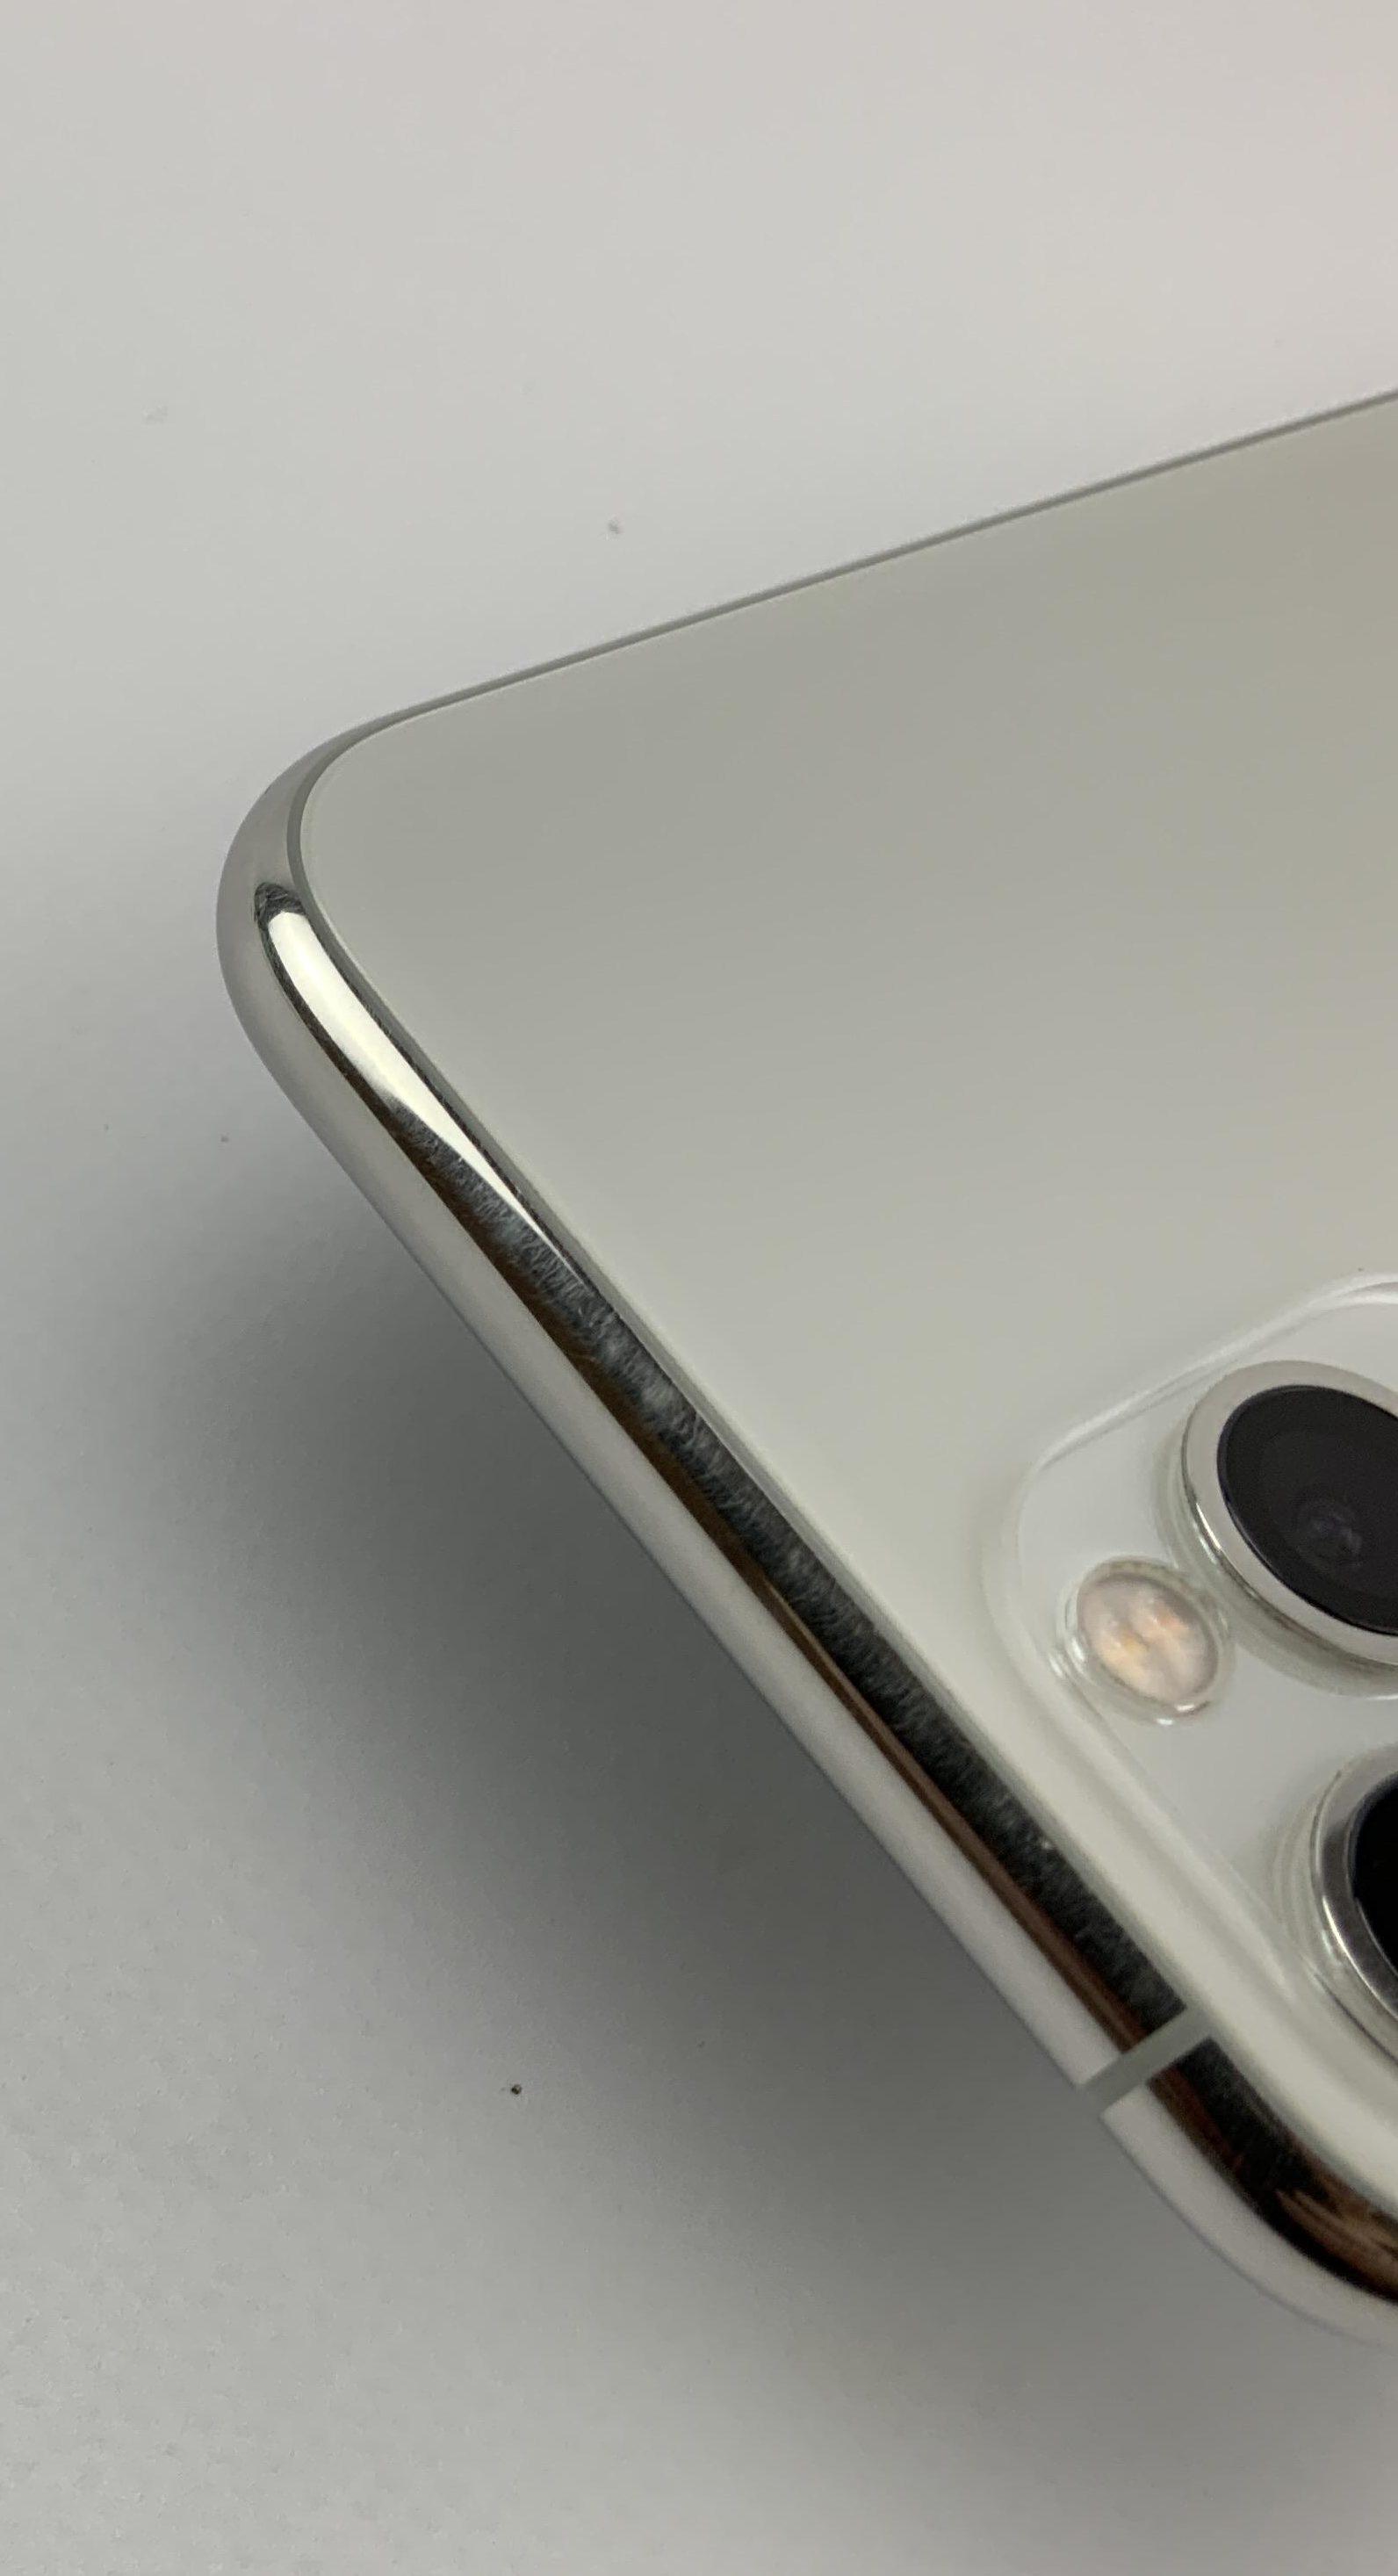 iPhone 11 Pro 256GB, 256GB, Silver, imagen 3